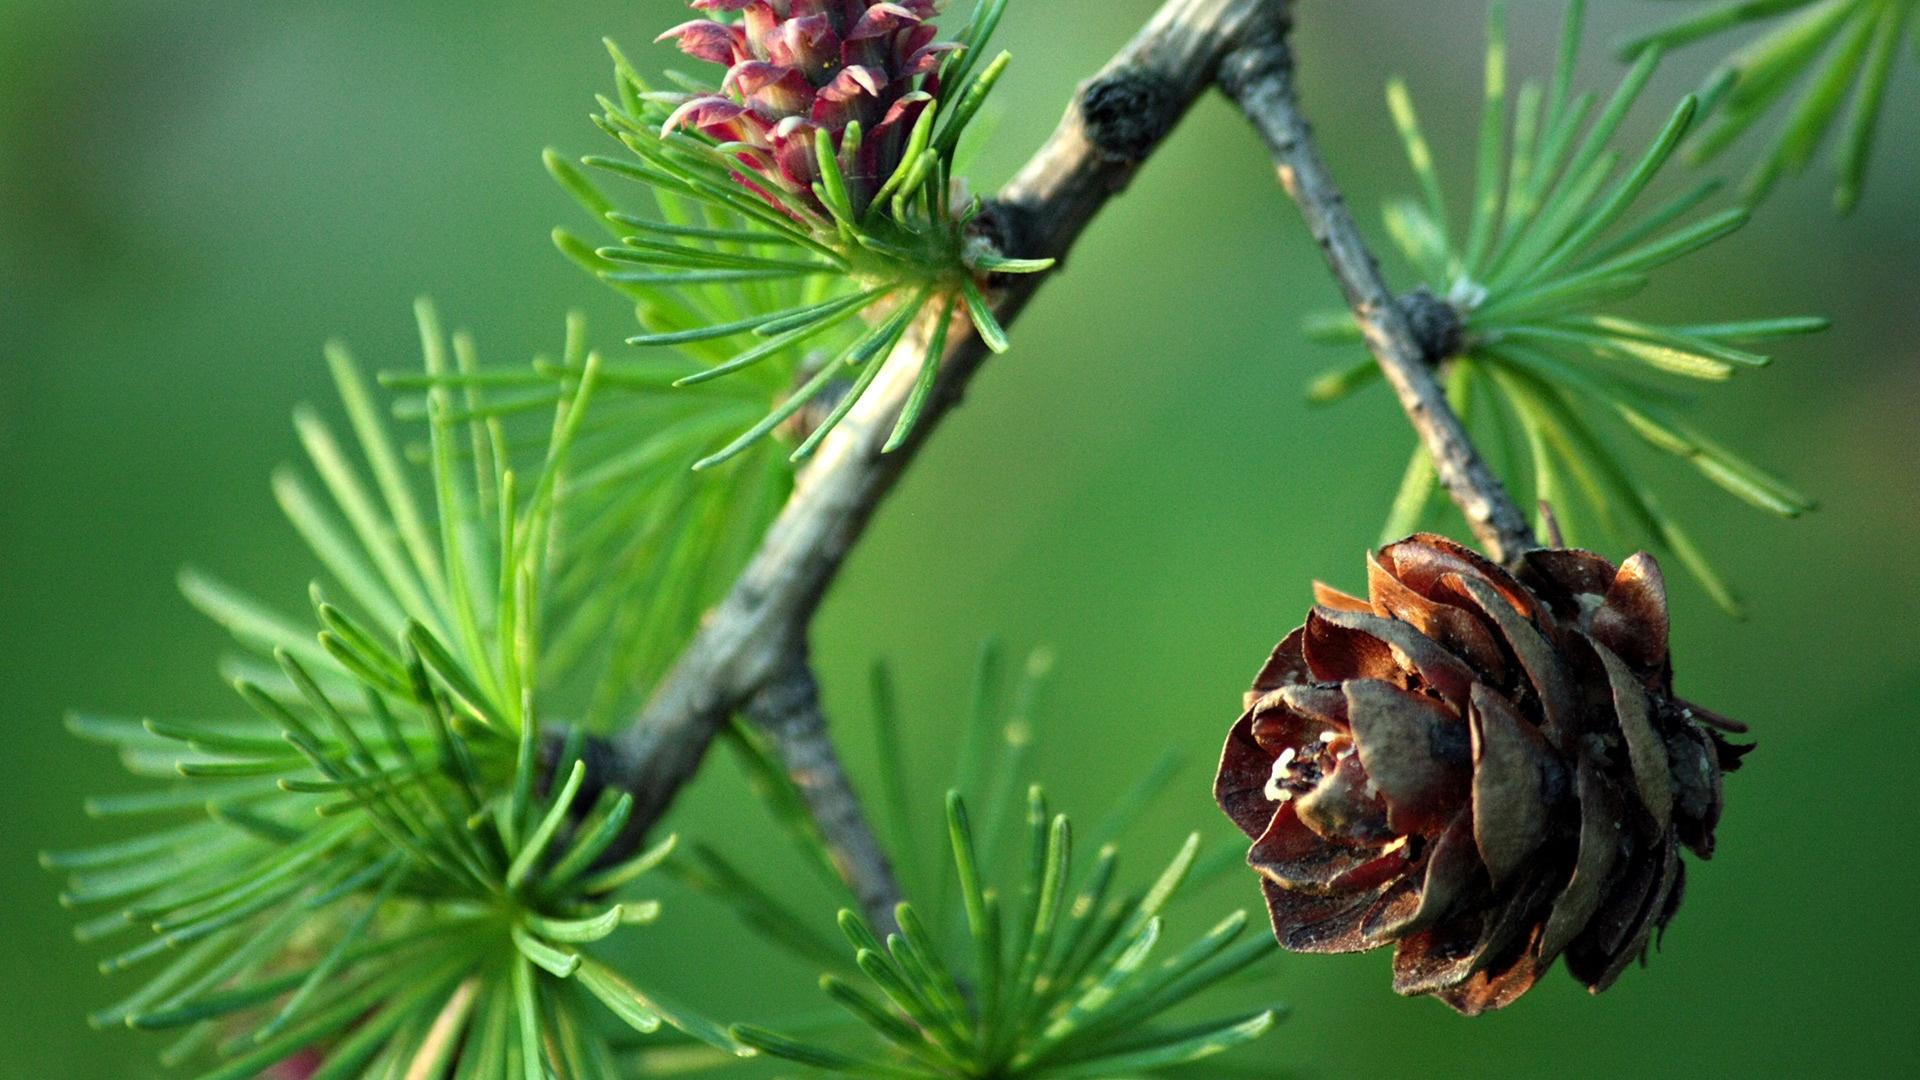 beautiful pinecone wallpaper 23354